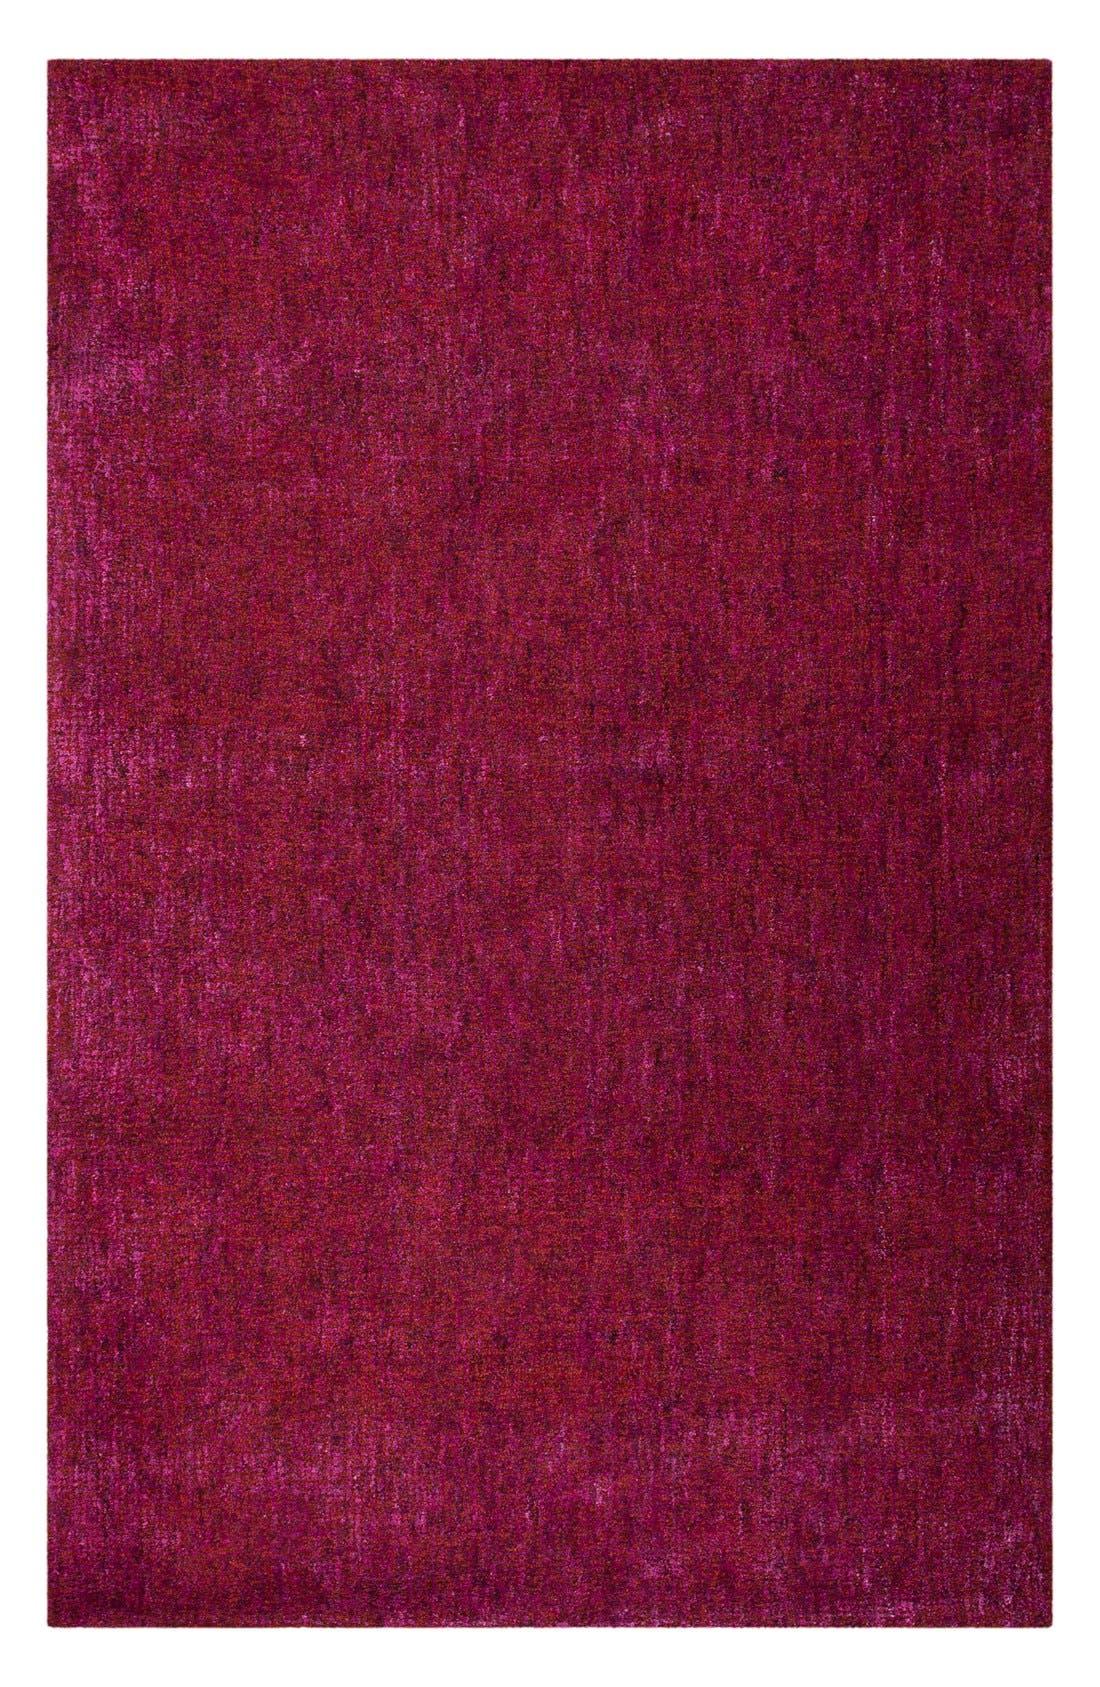 'stuyvesant' rug,                             Alternate thumbnail 3, color,                             600